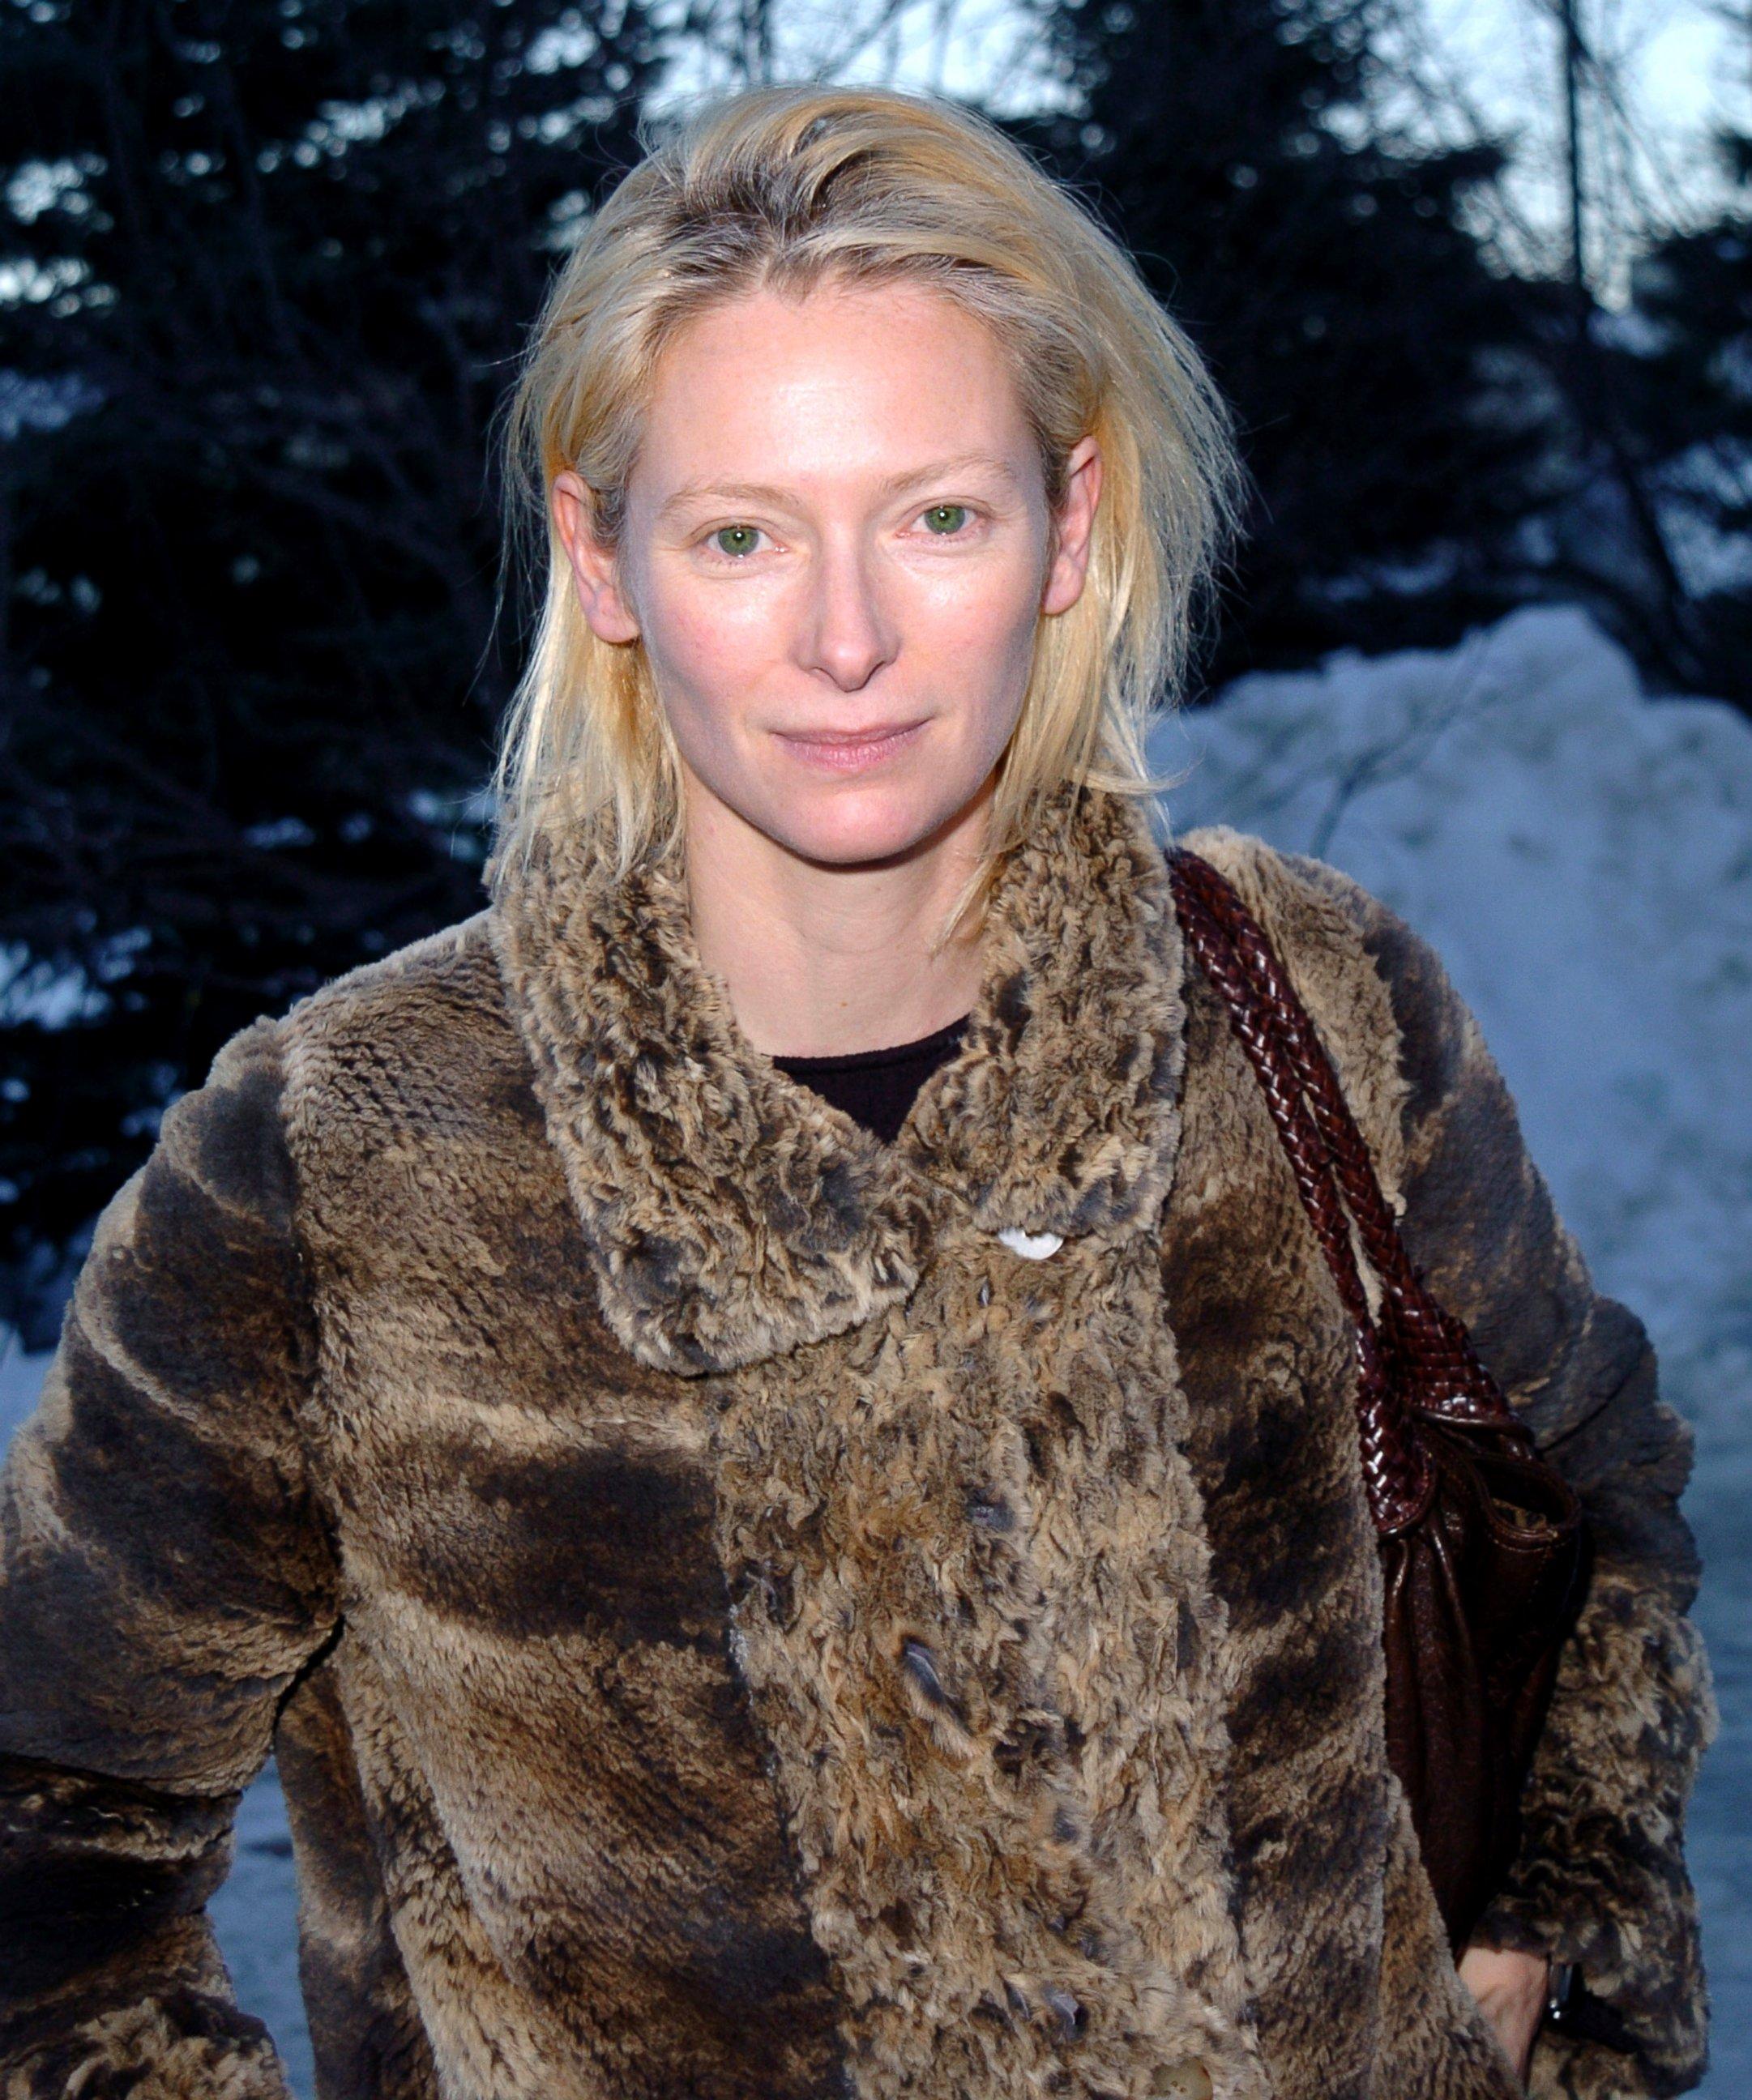 Tilda Swinton Photos and Images - ABC News